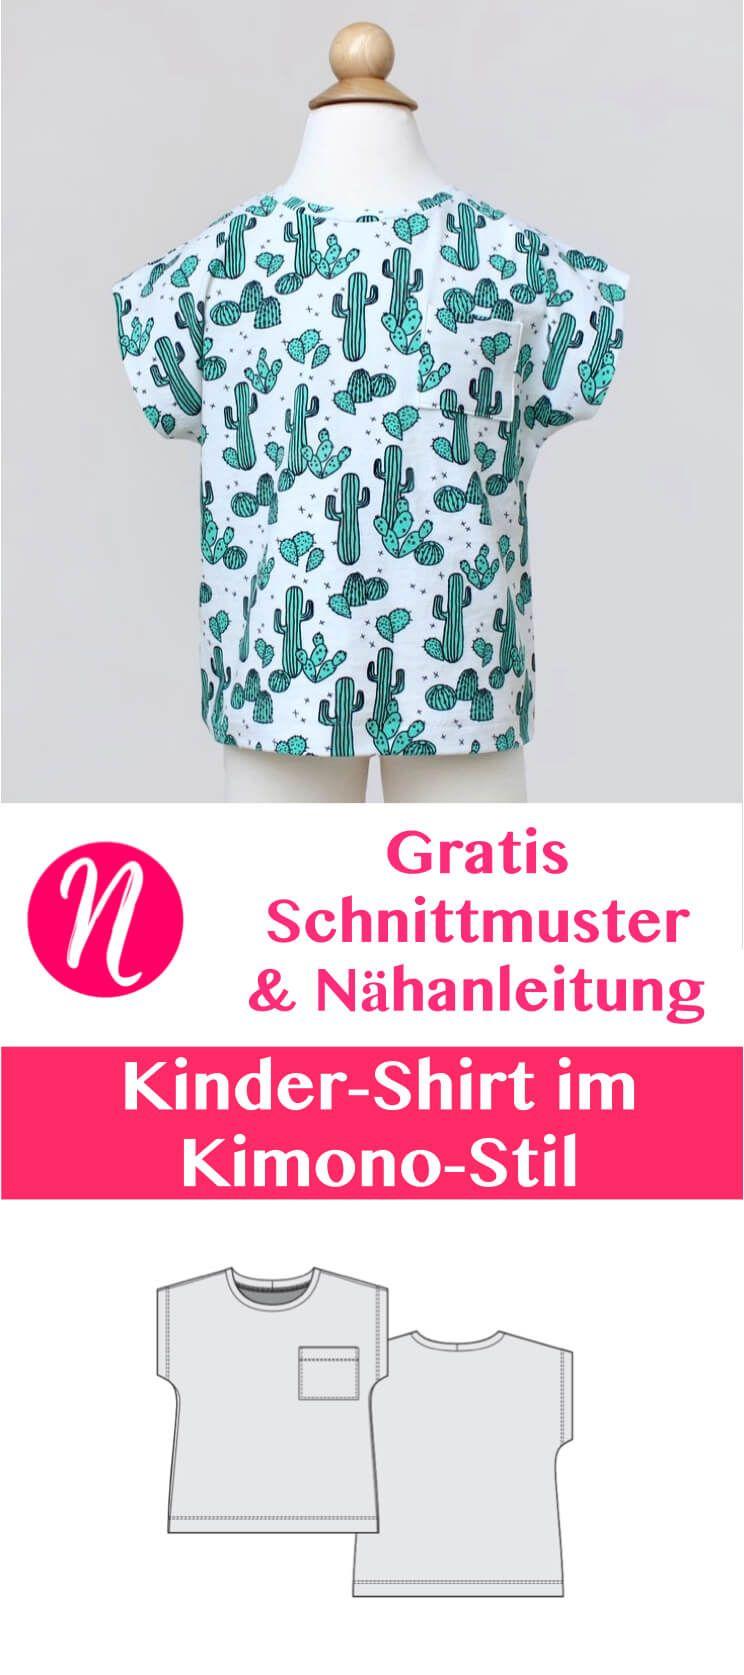 Kindershirt im Kimono-Stil - Freebook | Kimono-stil, Kostenlos und ...